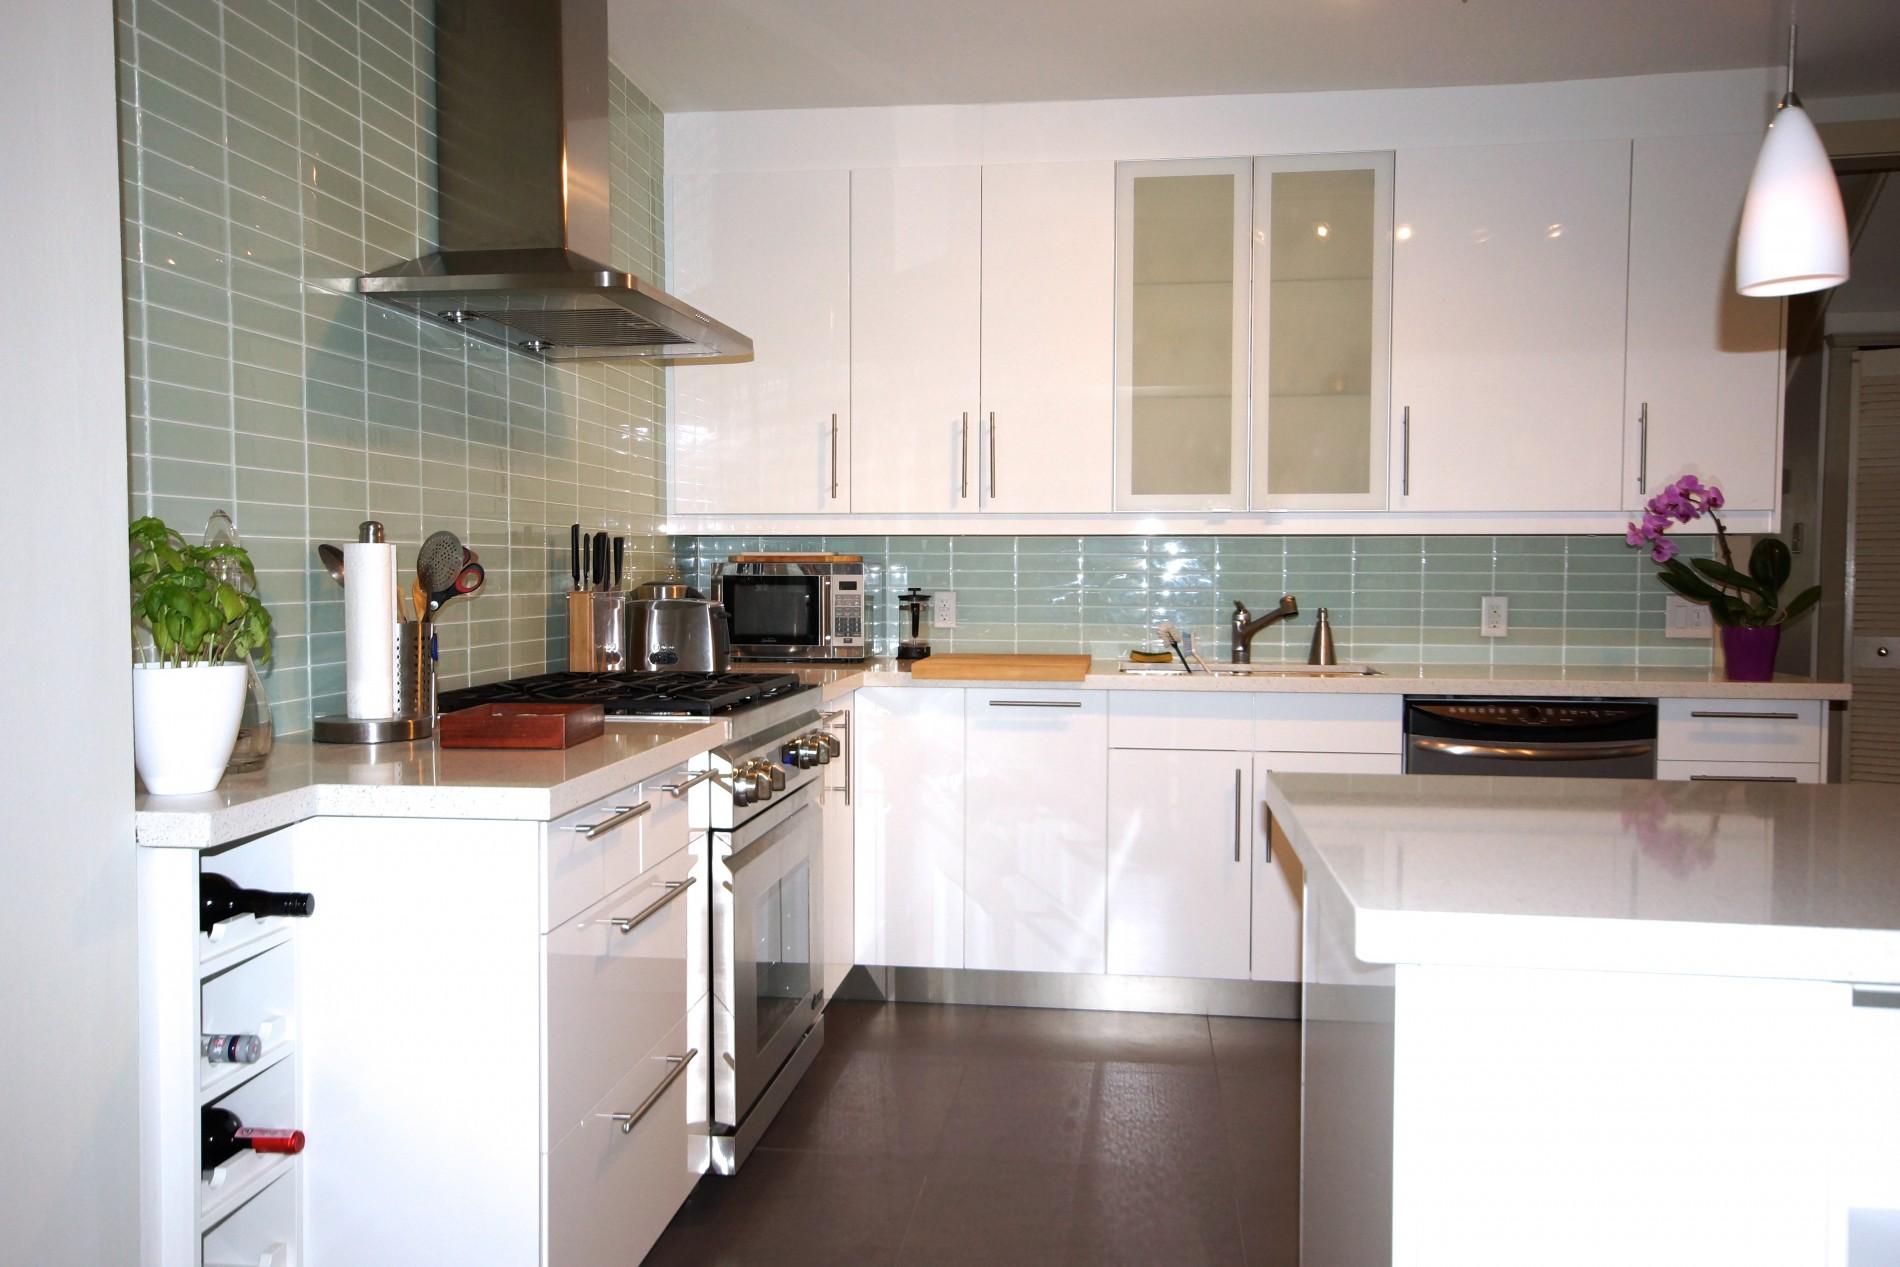 Toronto Beaches Modern Kitchen - Featured Image